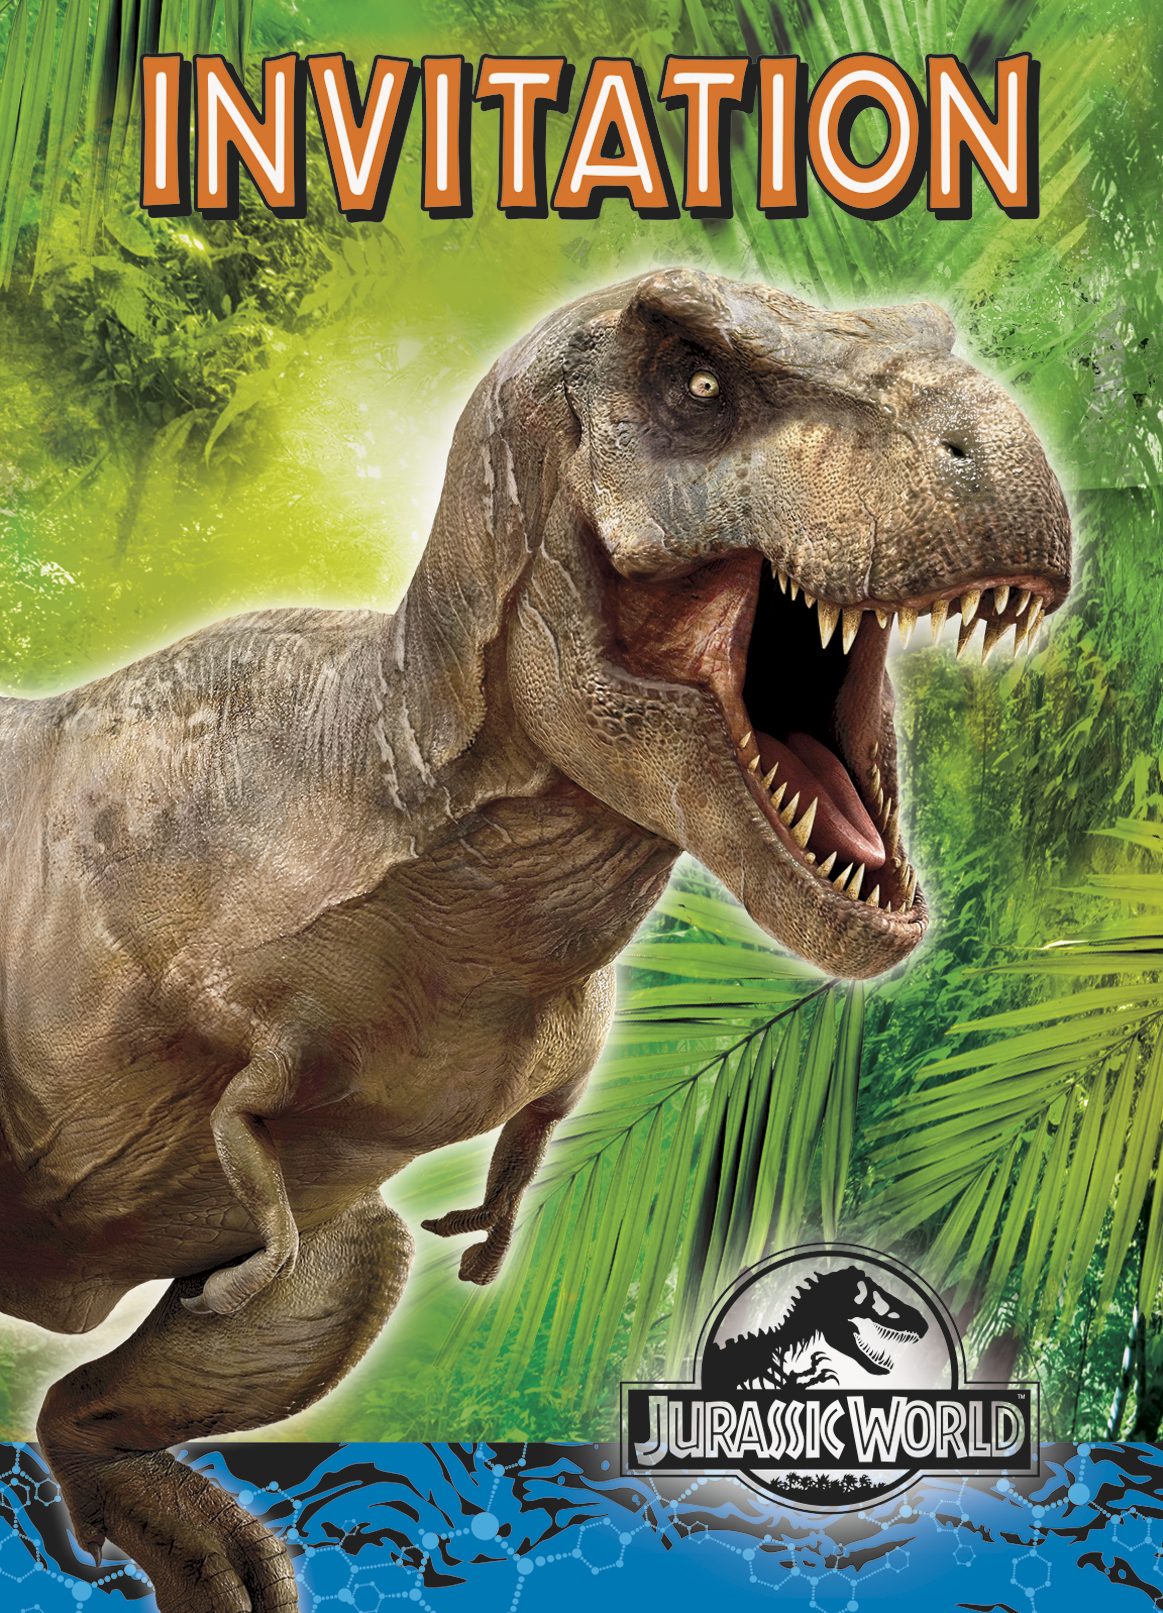 Dinosaur Birthday Invites for perfect invitations design